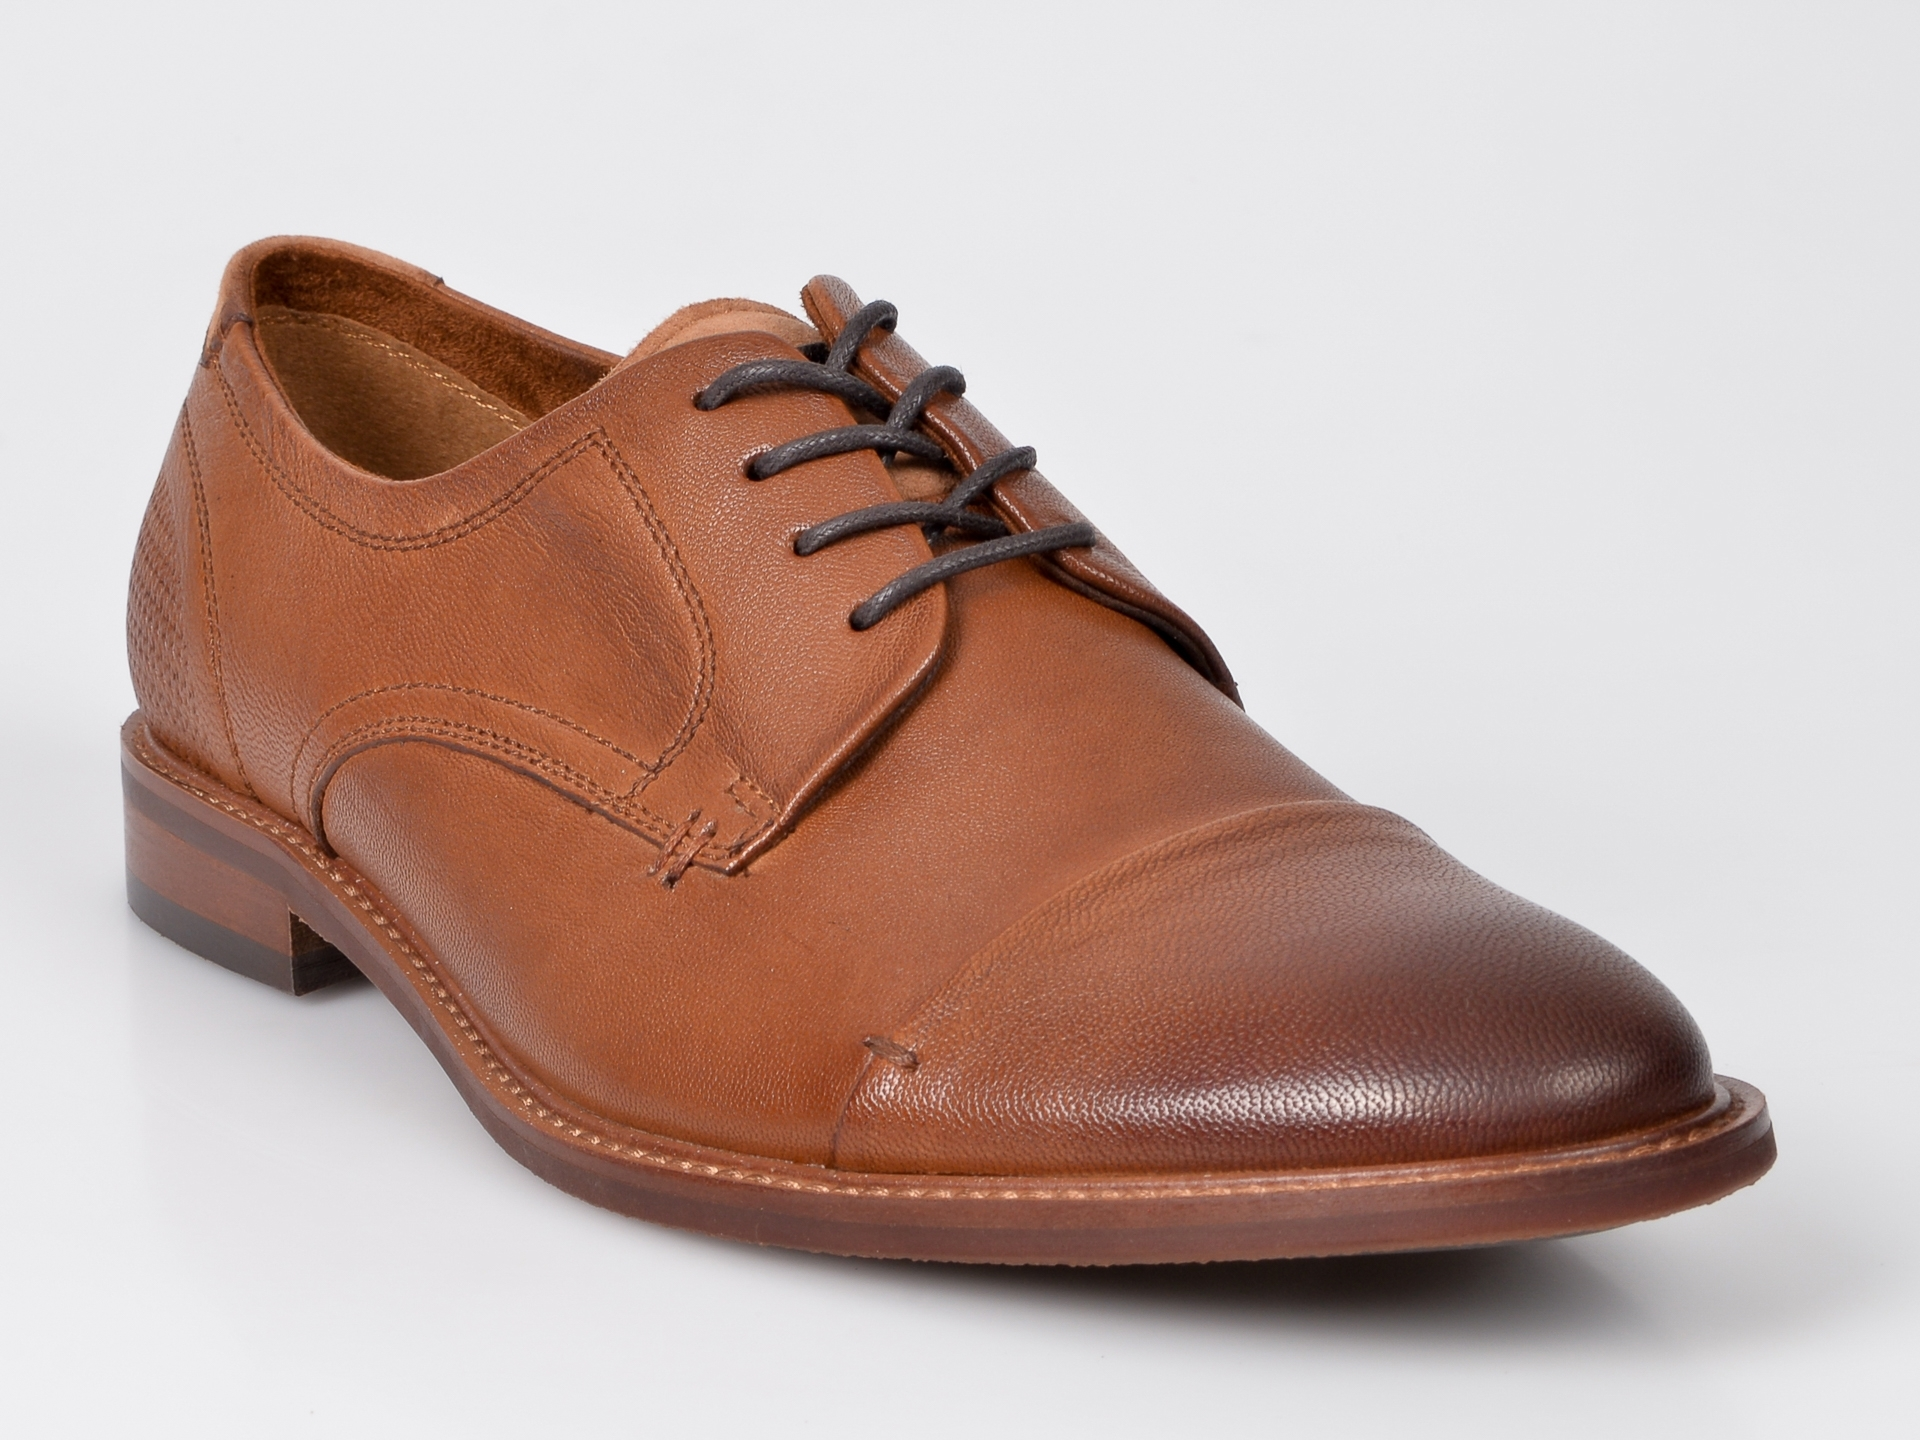 Pantofi ALDO maro, Cradowen, din piele naturala imagine